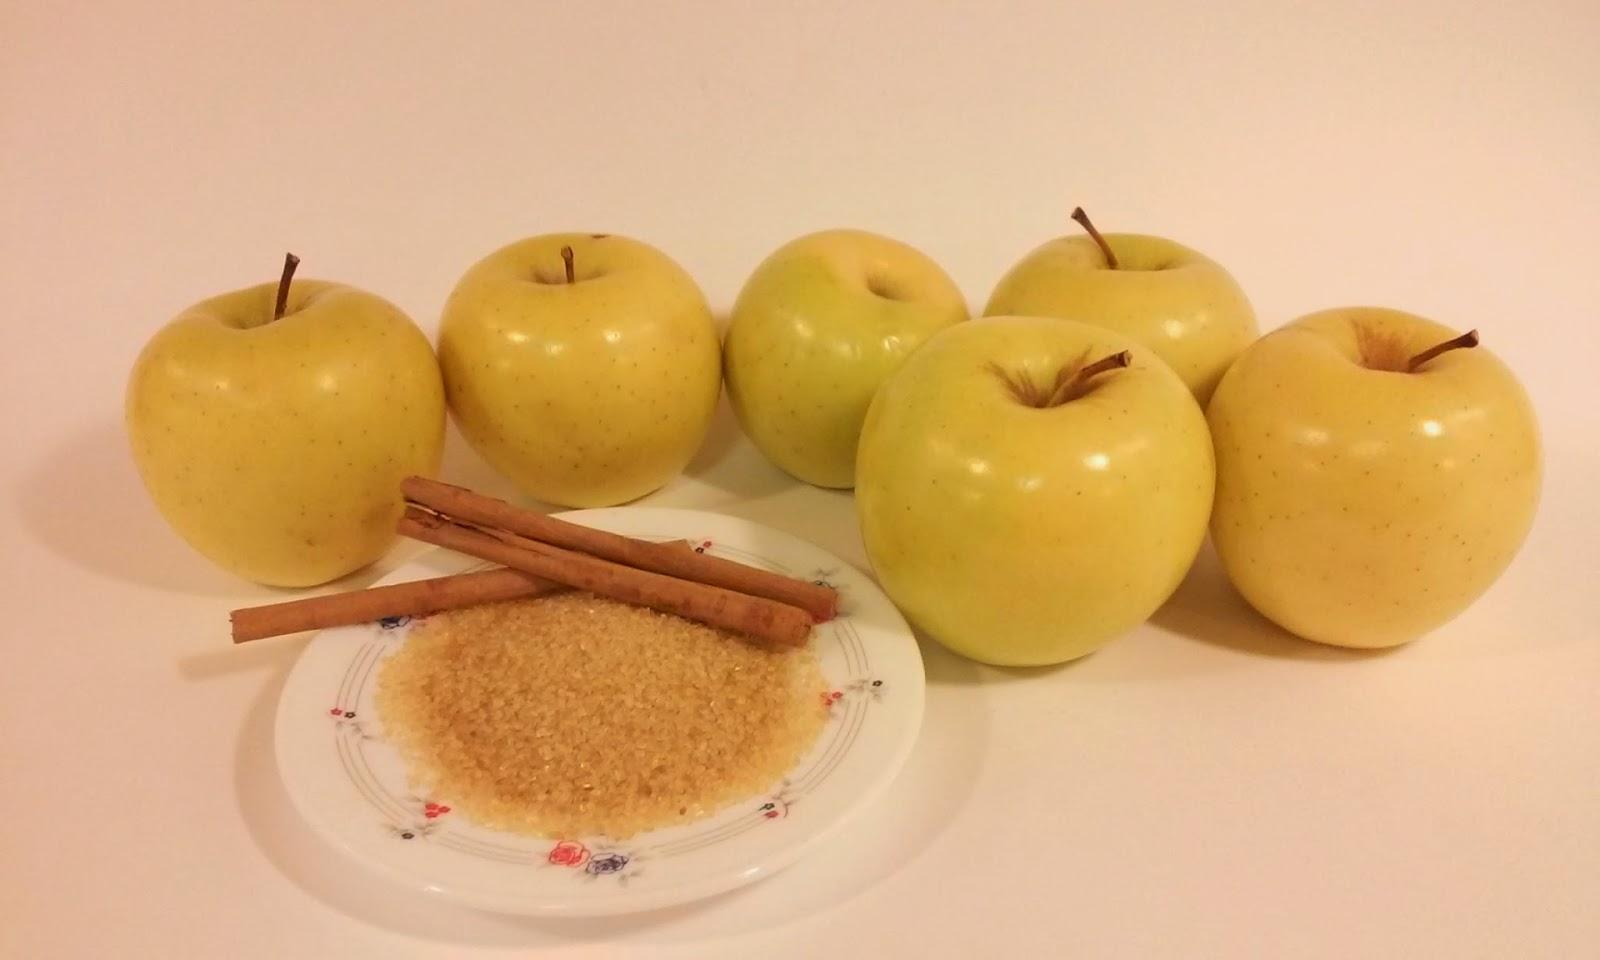 Manzanas al horno con canela